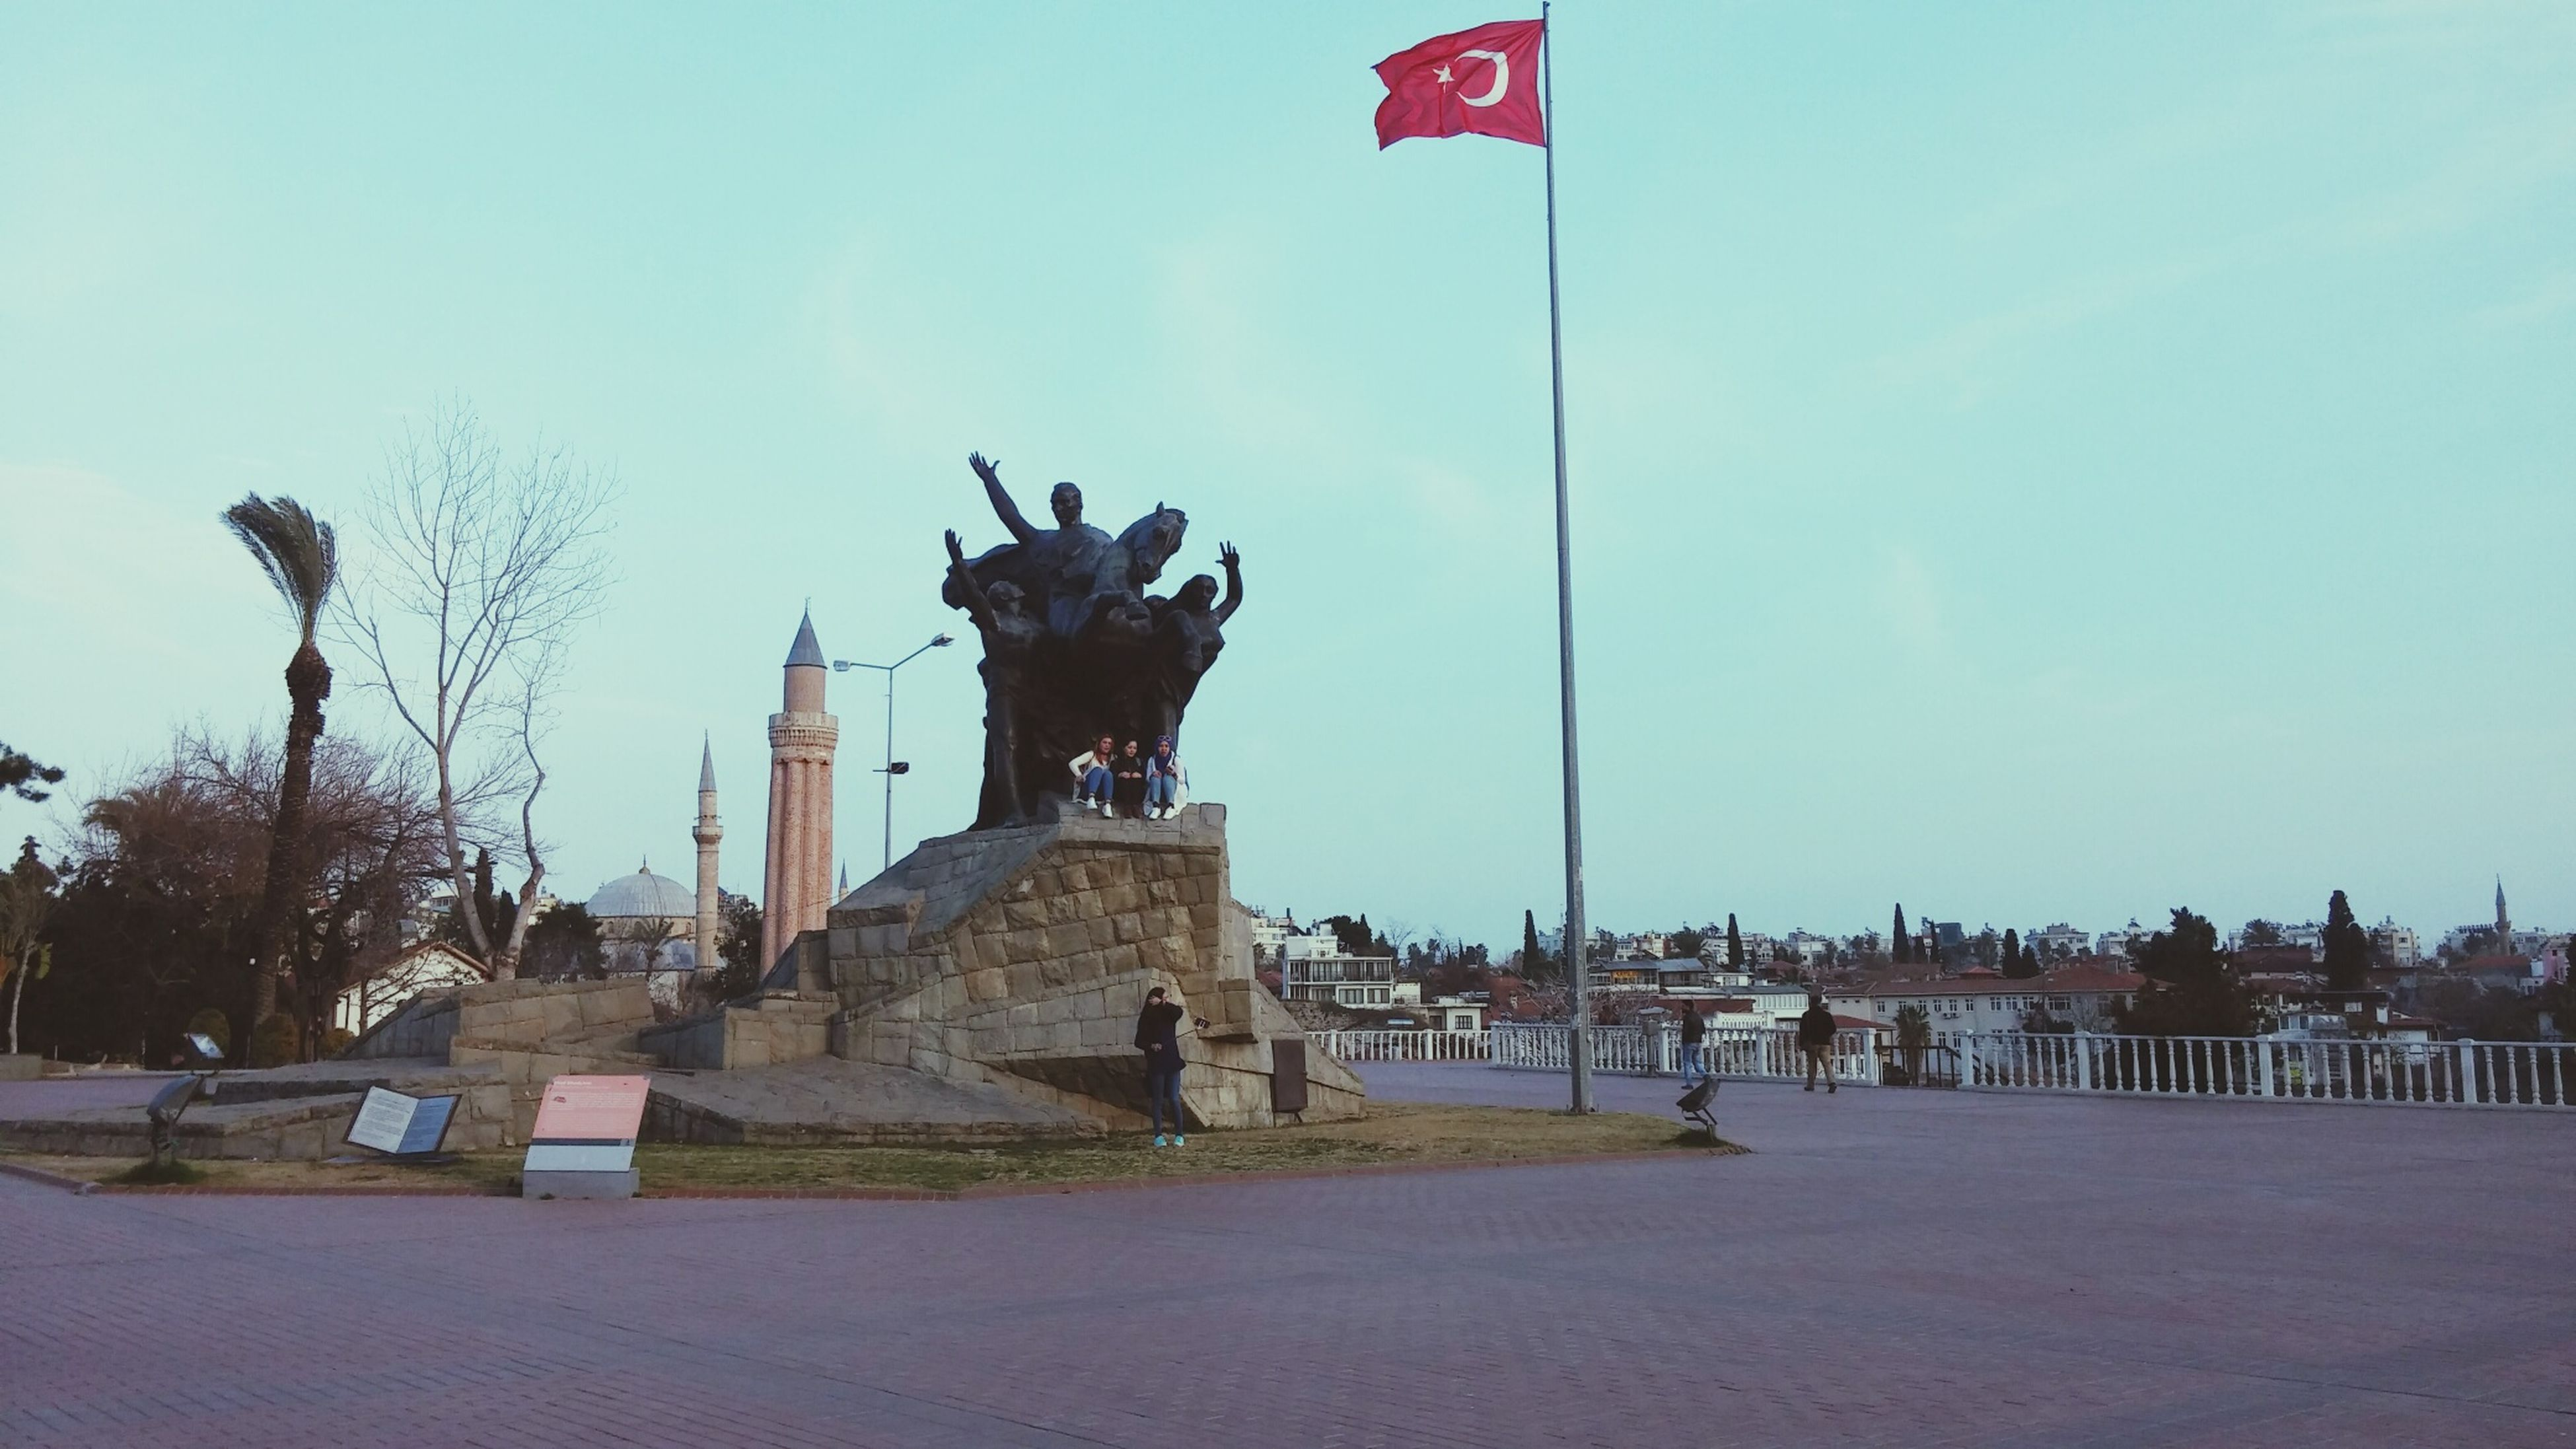 Antalya City 2017 Turkey Yivliminare Atatürk Heykeli